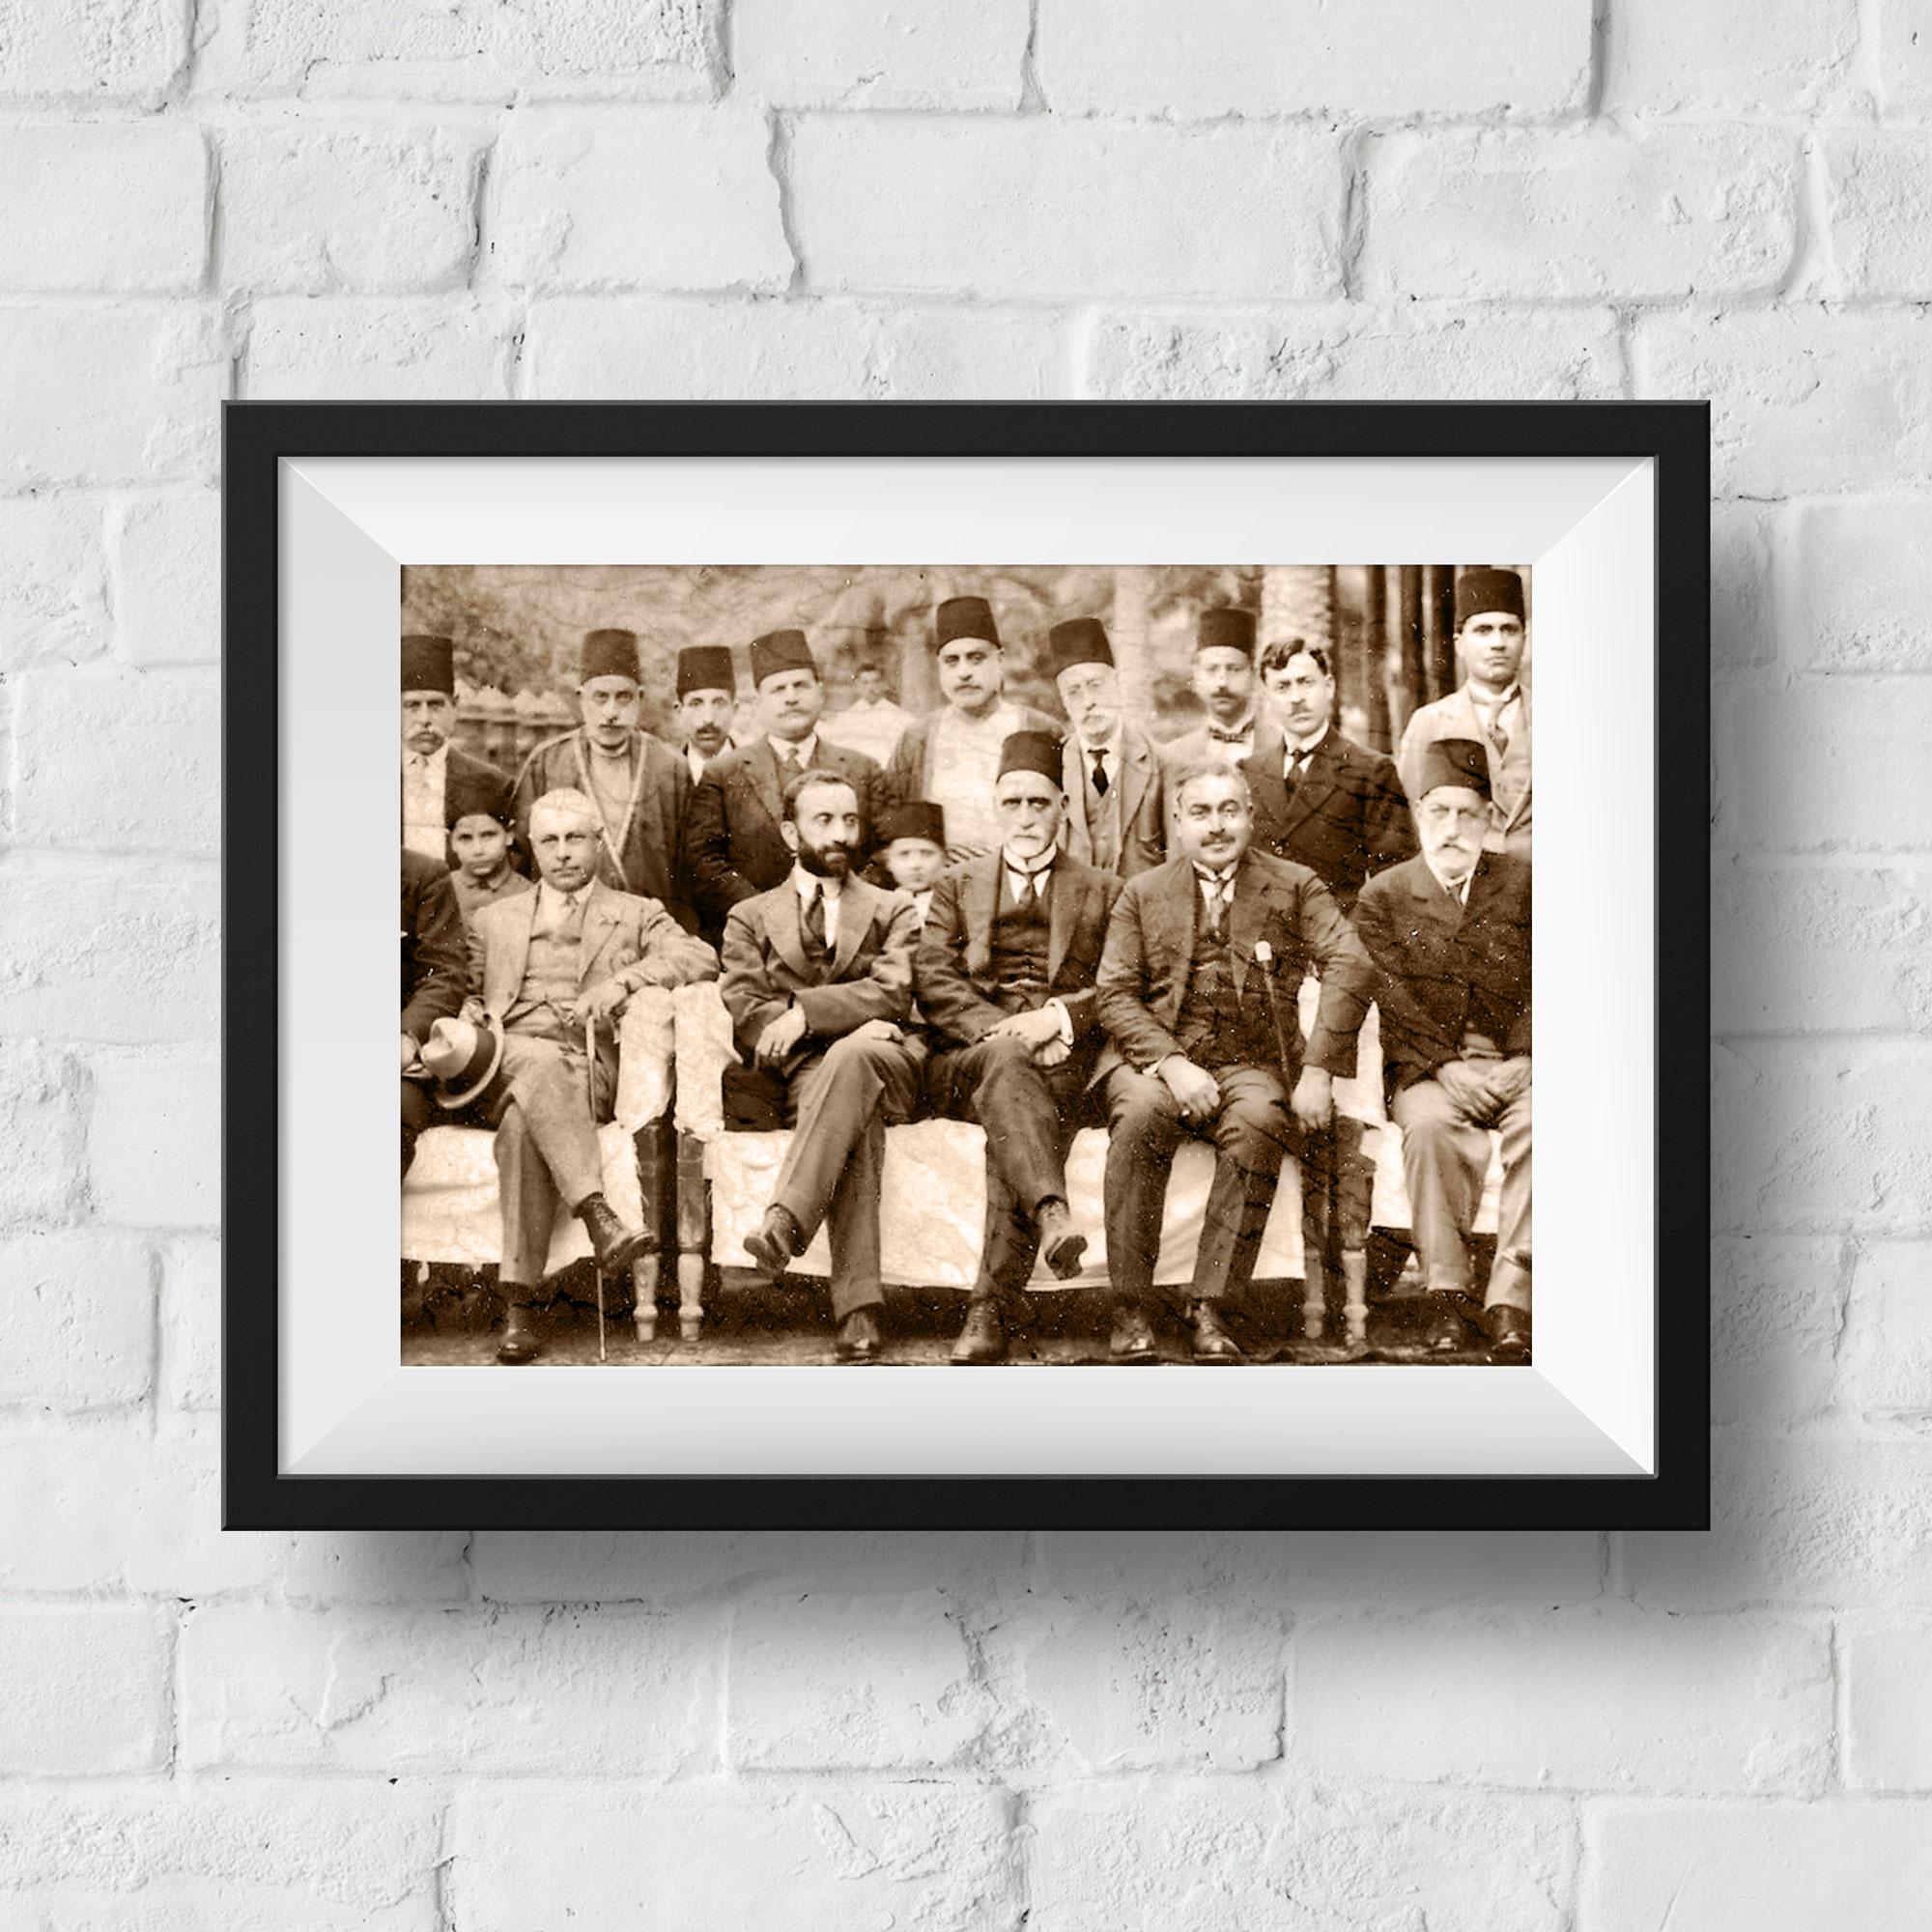 les-ottomans-framed-horizontal-original-2000-2000